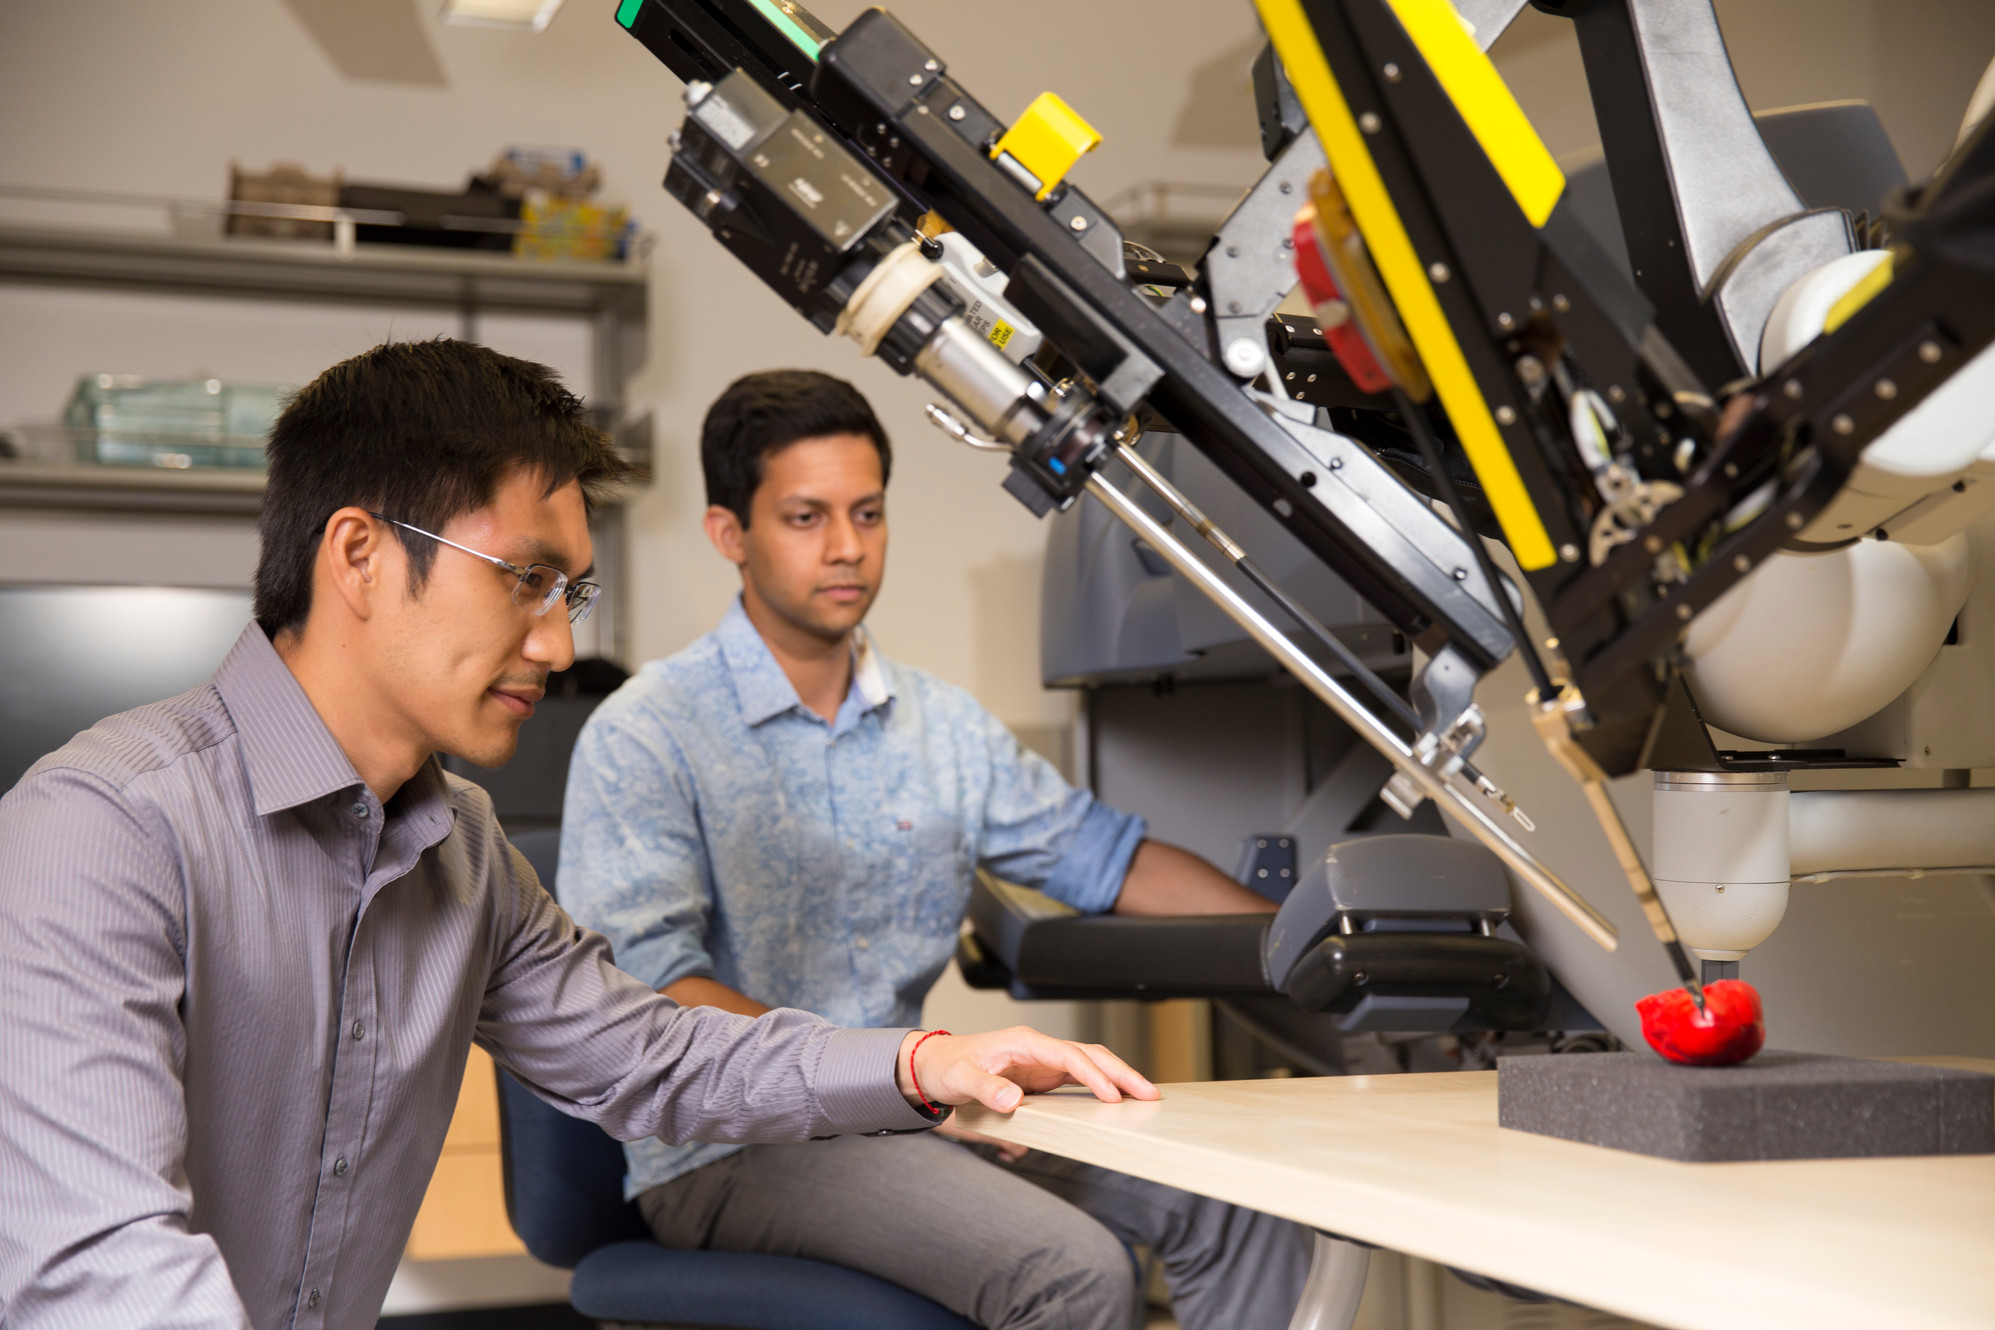 People | UCSD Advanced Robotics and Controls Lab